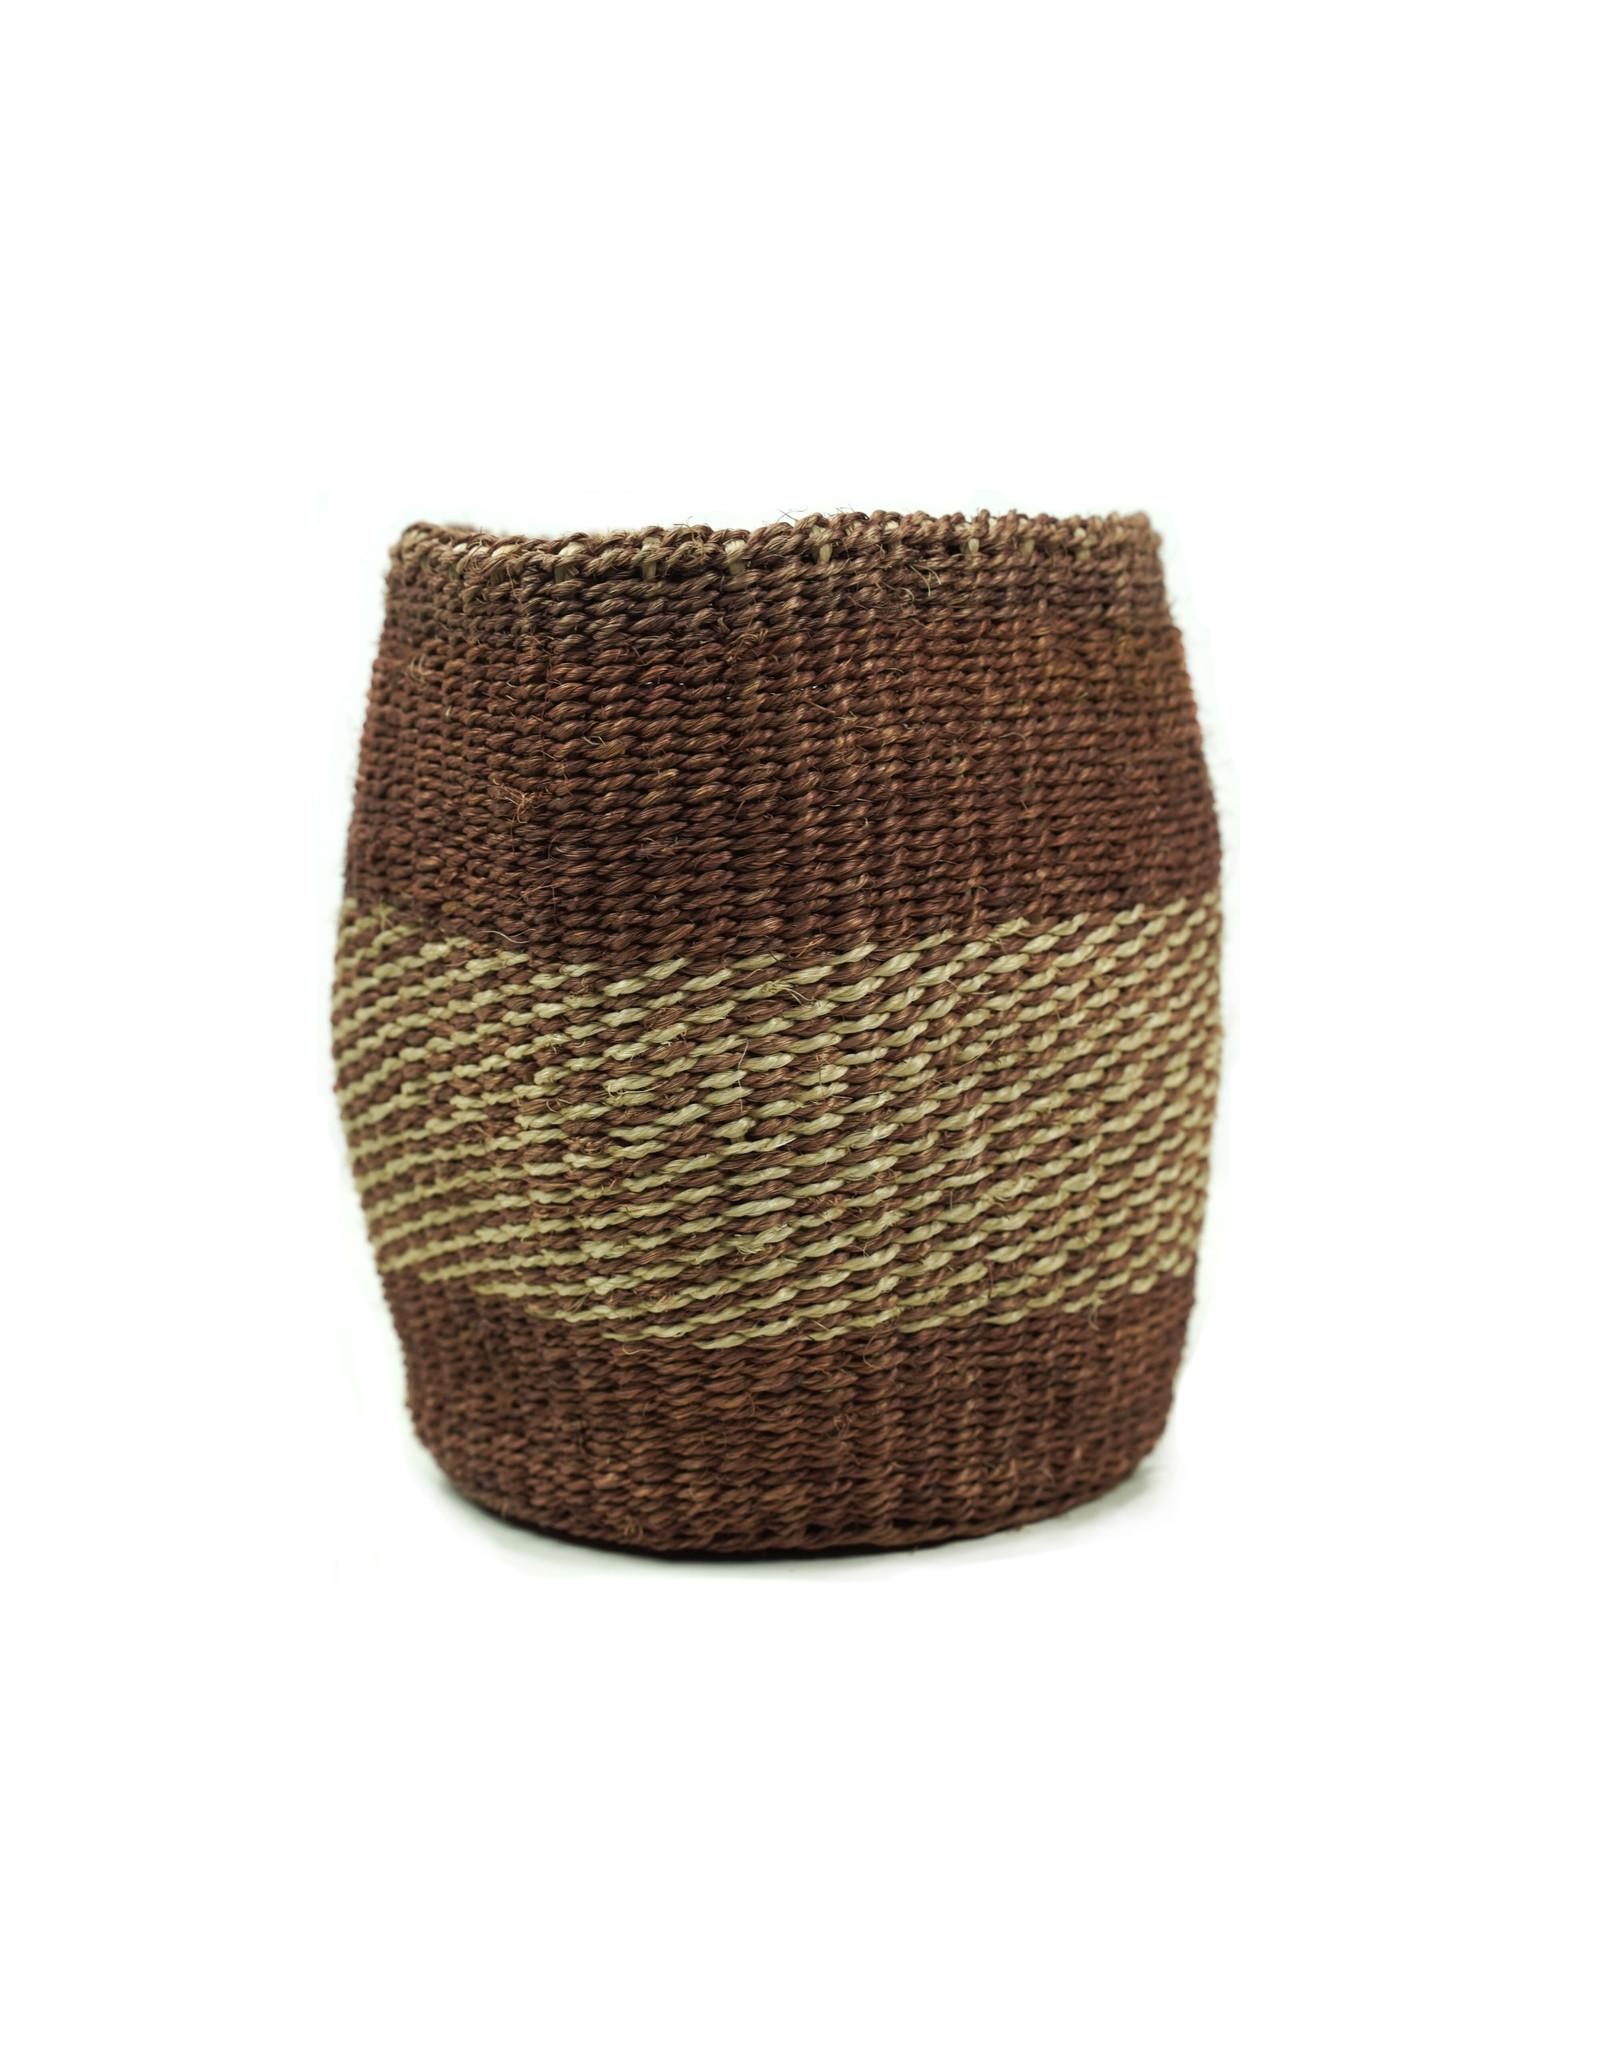 Maisha.Style Taita basket - rusty & reed - S8